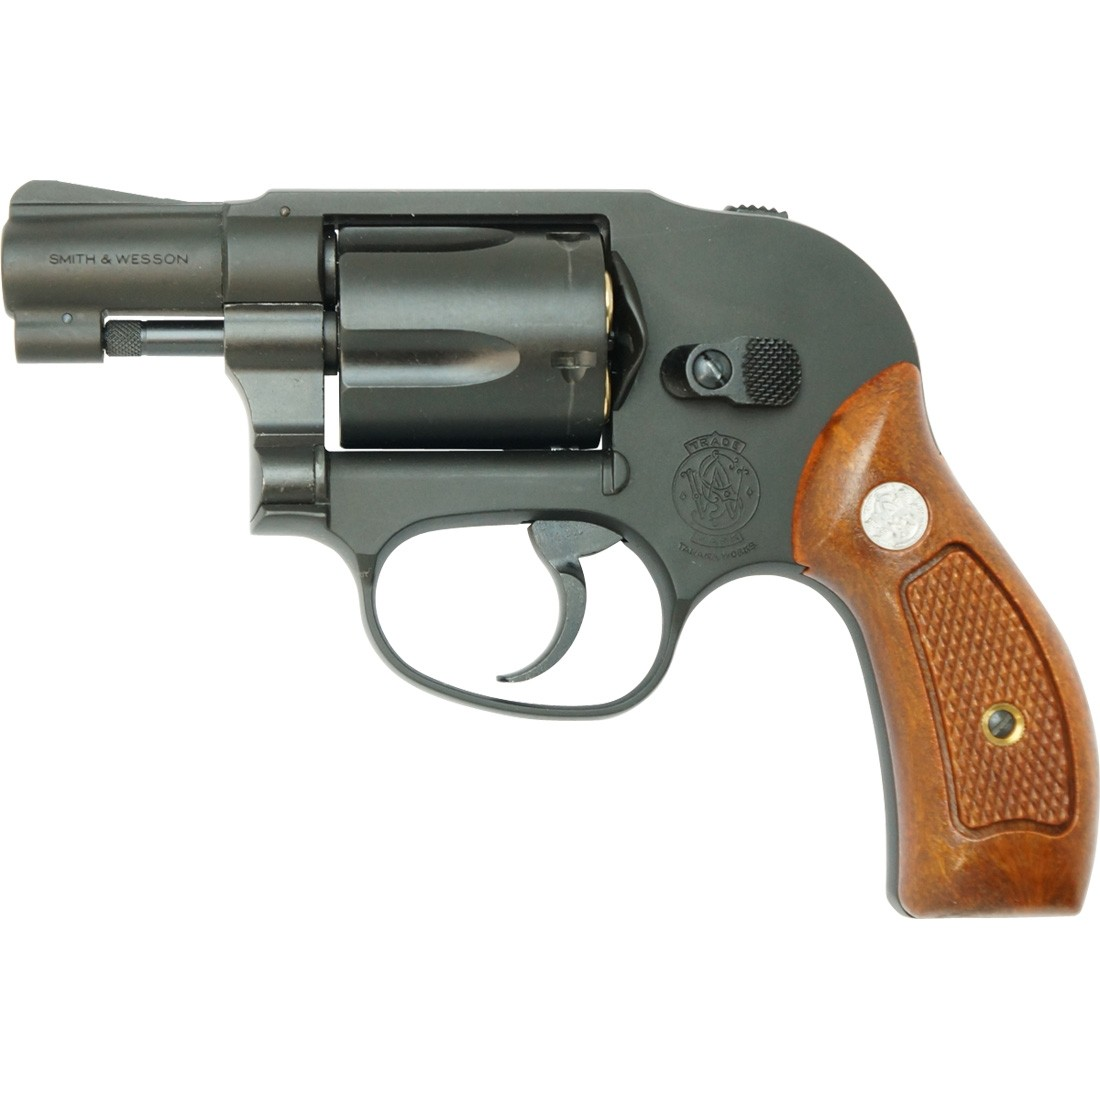 "Tanaka S&W M49 Bodyguard 2"" HW Airsoft Gas Revolver"